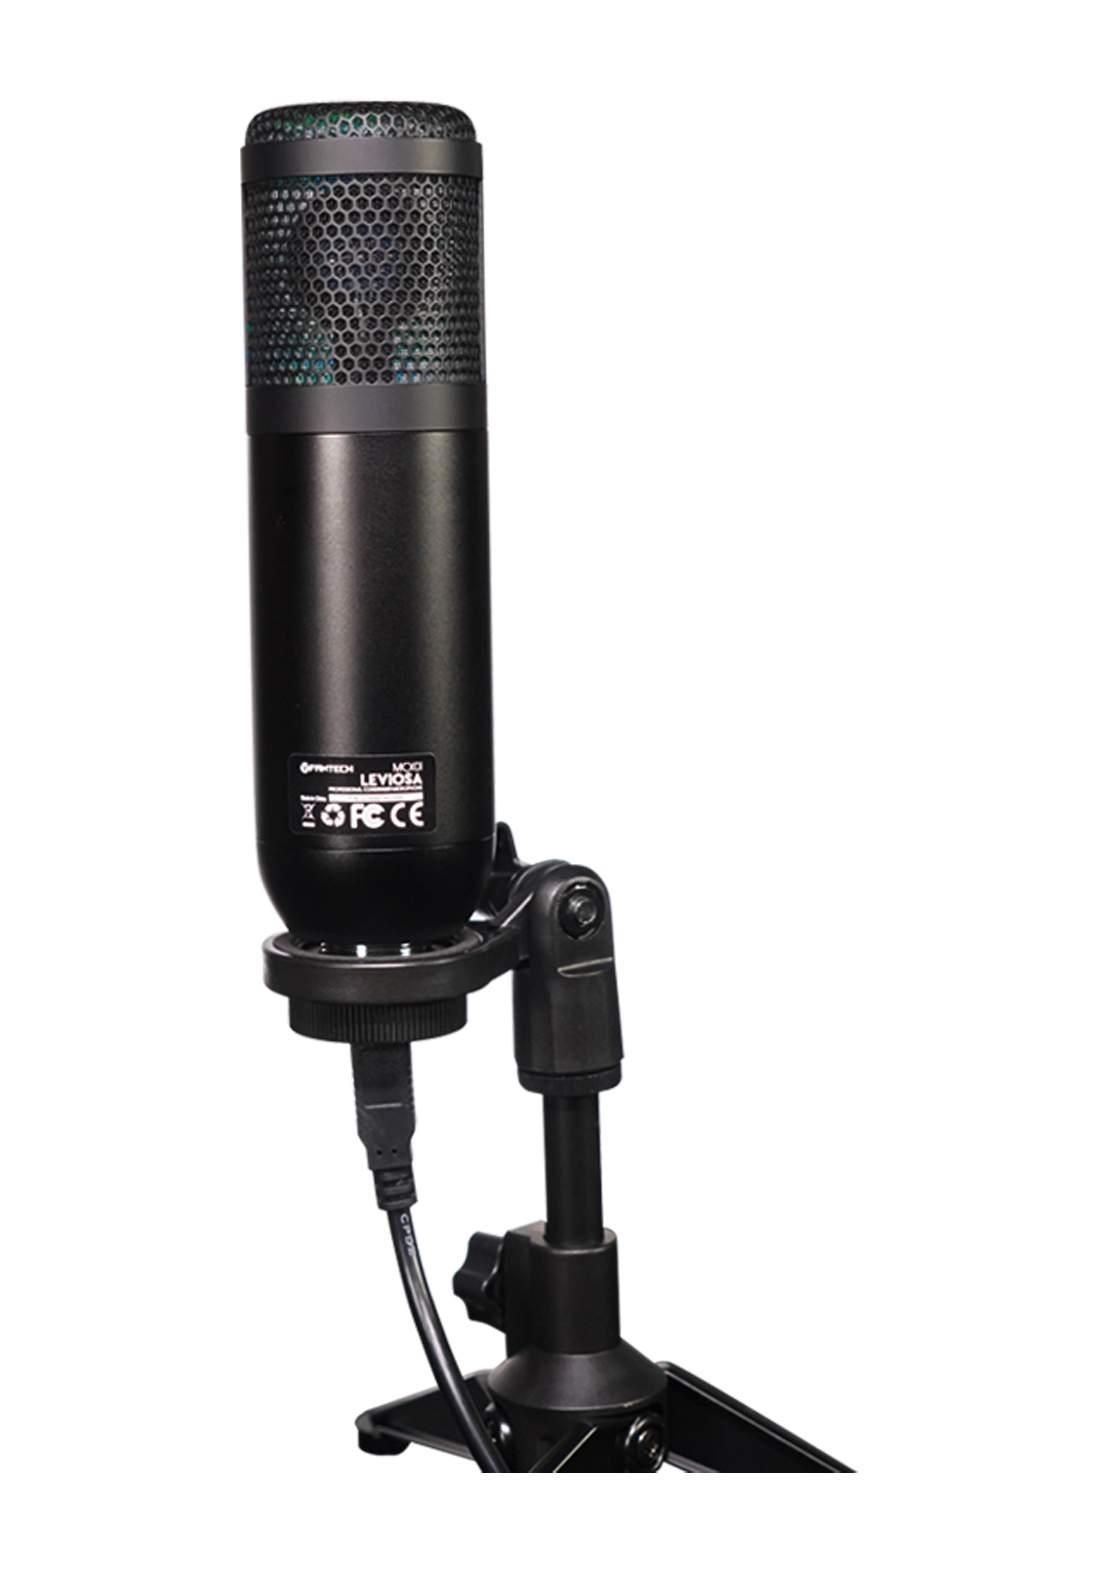 Fantech MCX01 Leviosa Condenser Microphone - Black مايكروفون